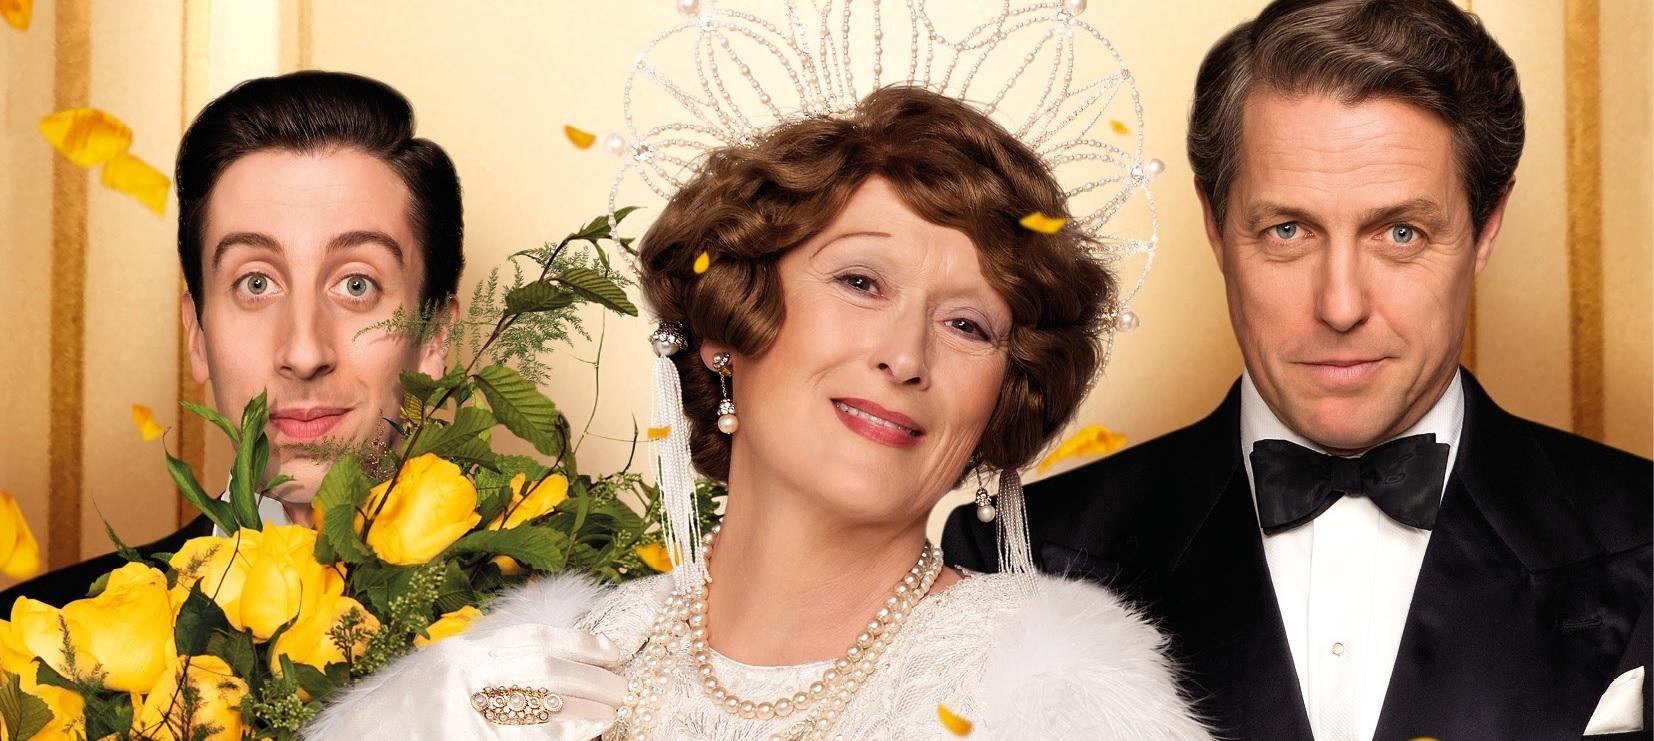 Florence-Foster-Jenkins-Poster-Meryl-Streep-Hugh-Grant